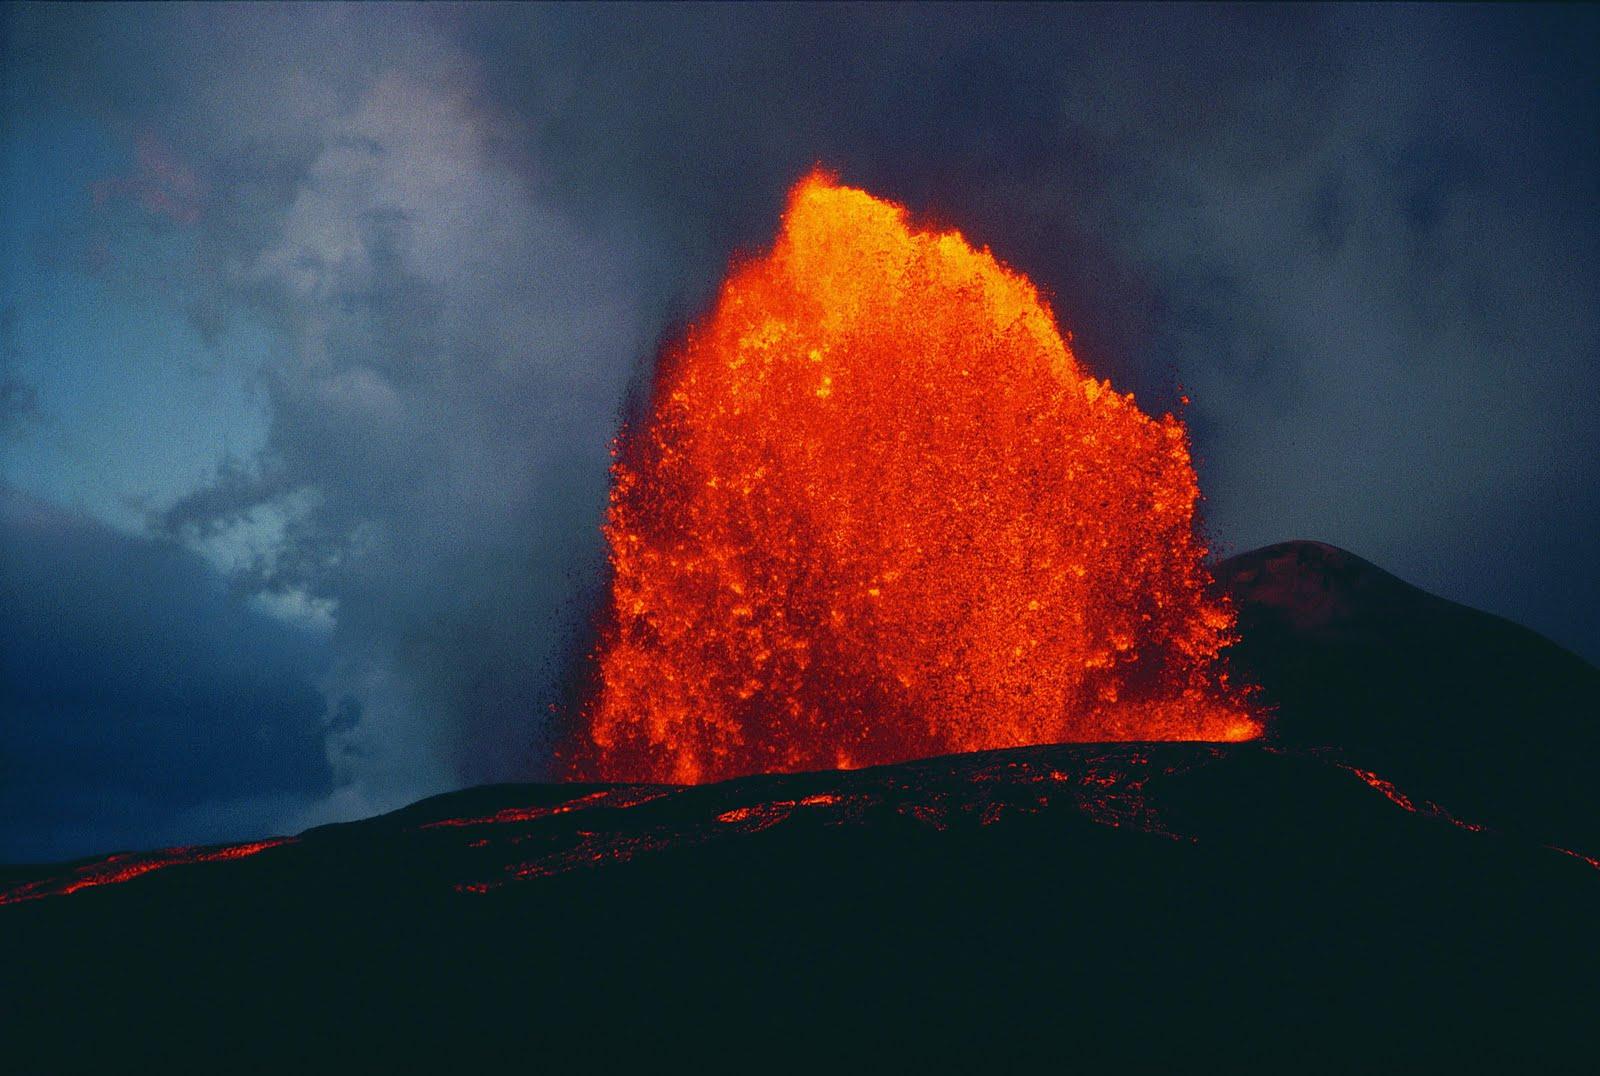 Hd Volcano Wallpaper 1600x1076